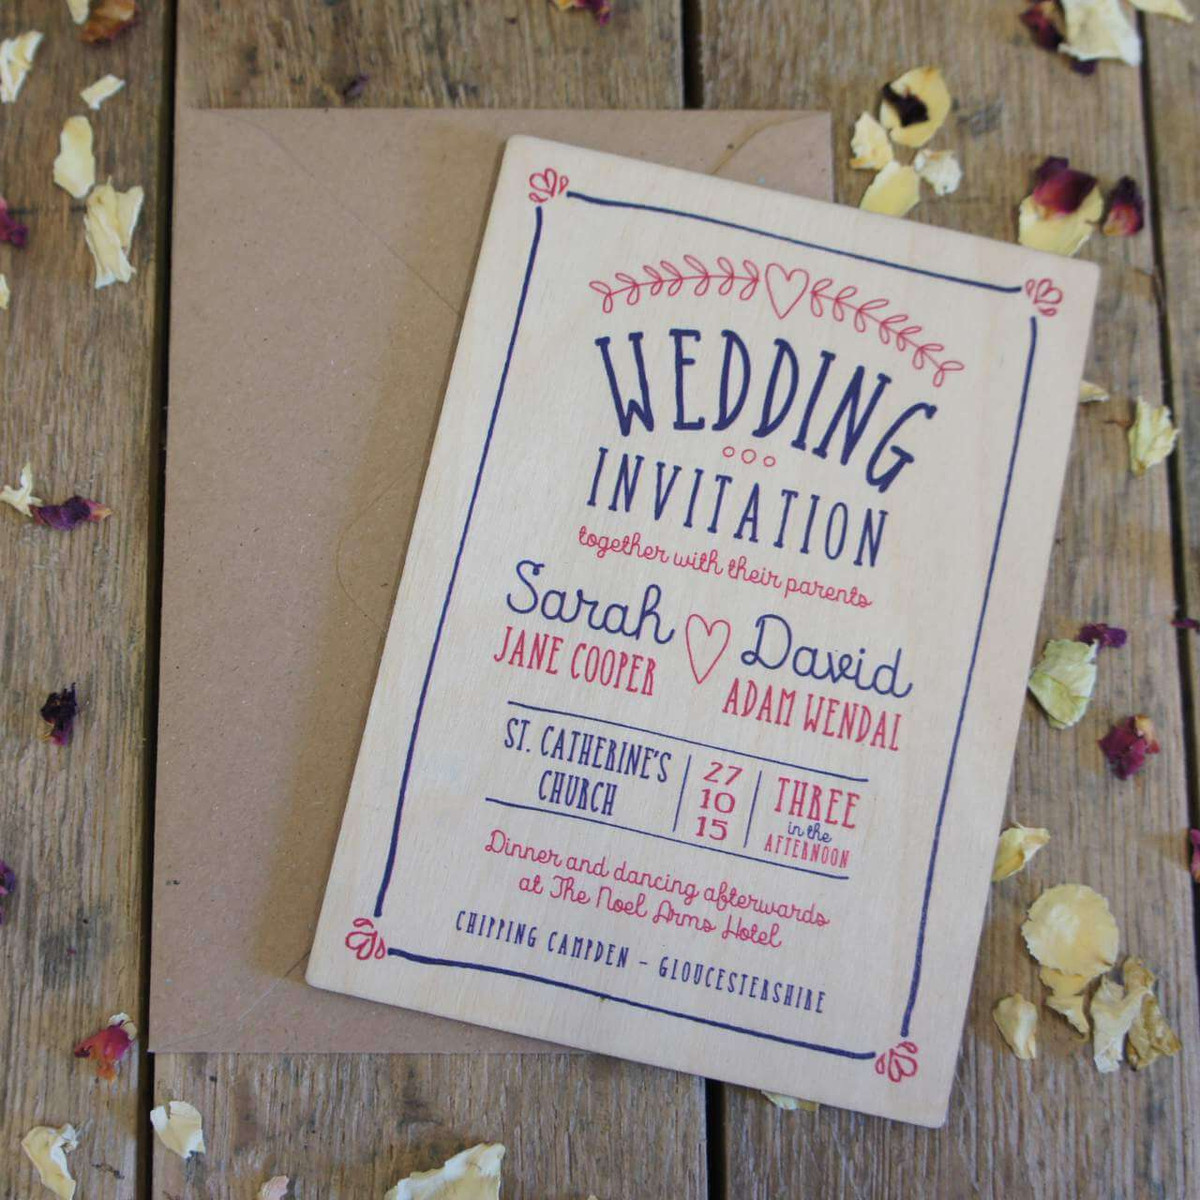 printed wedding invitations uk 28 images print wedding printed wedding invitations uk camdeco printed wooden wedding - Printed Wedding Invitations